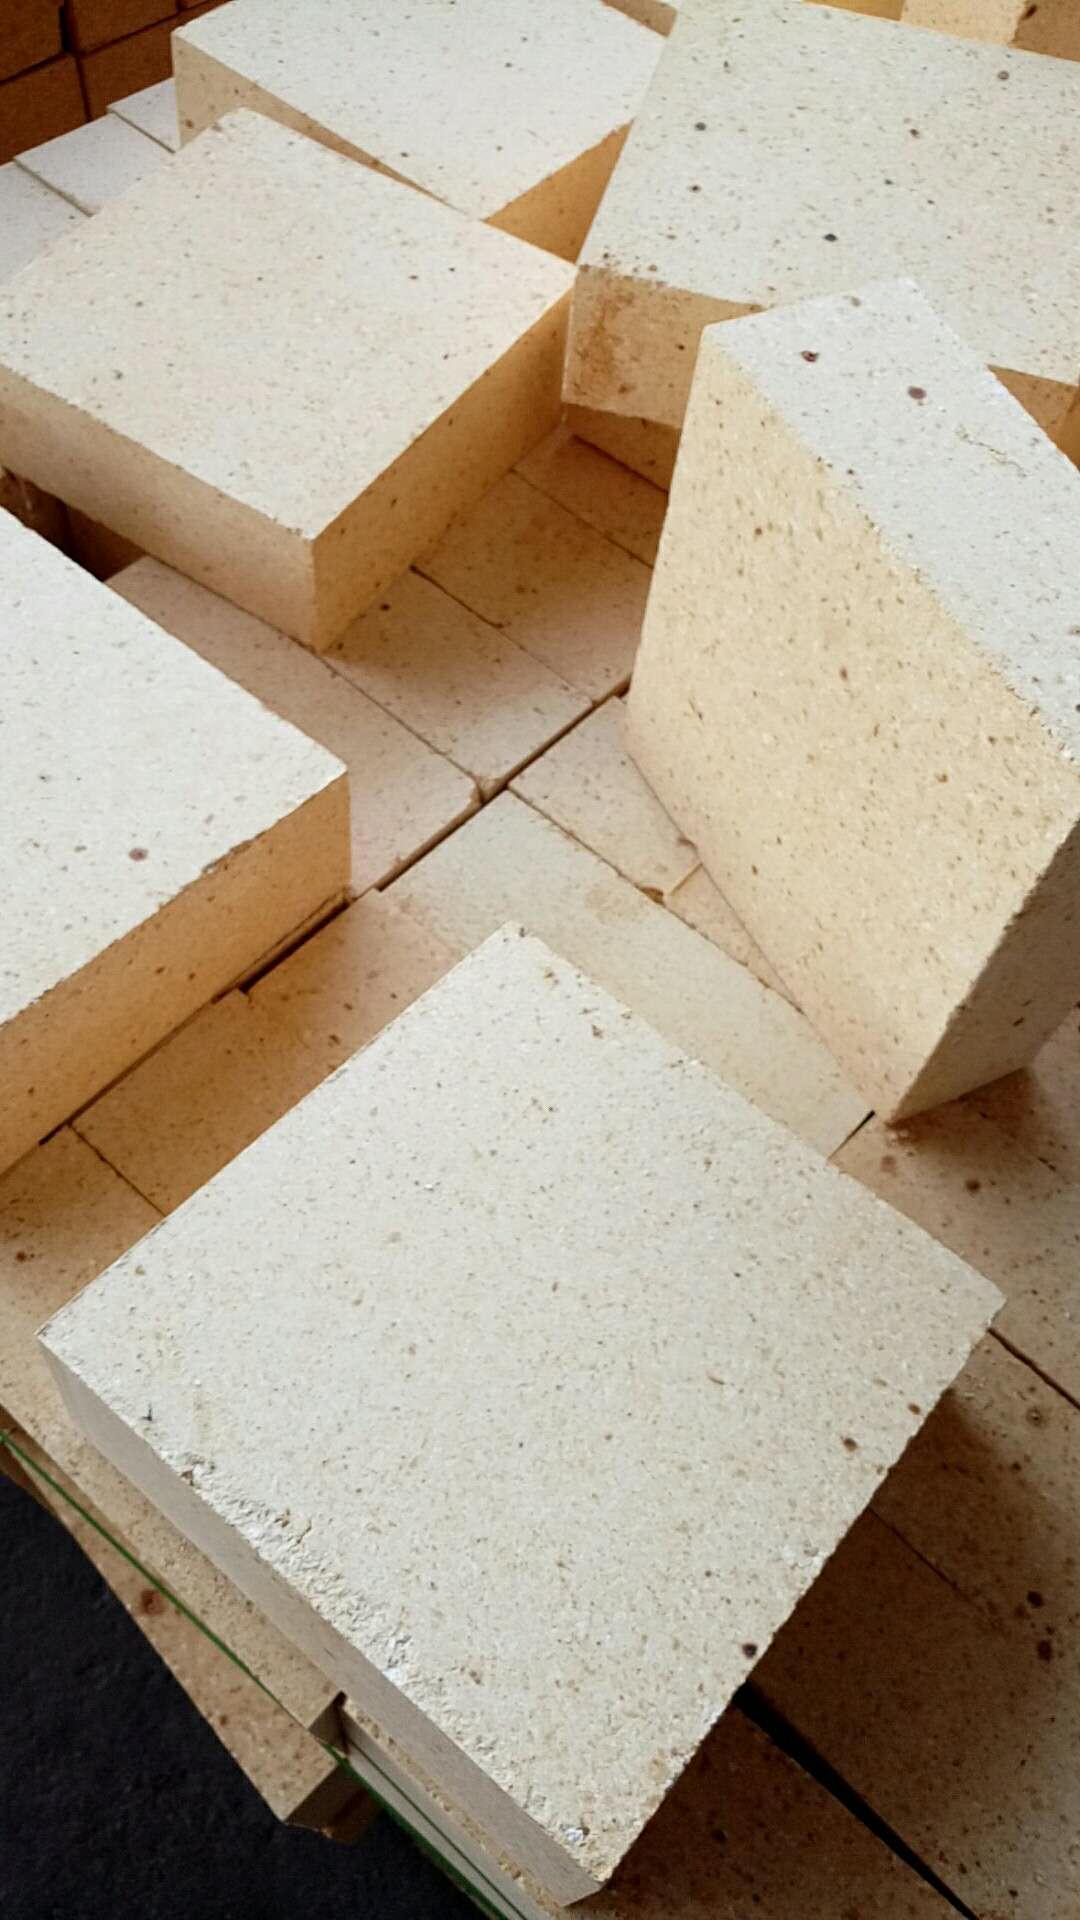 al 60 high alumina fire brick/refractory brick for sale China manufacturer